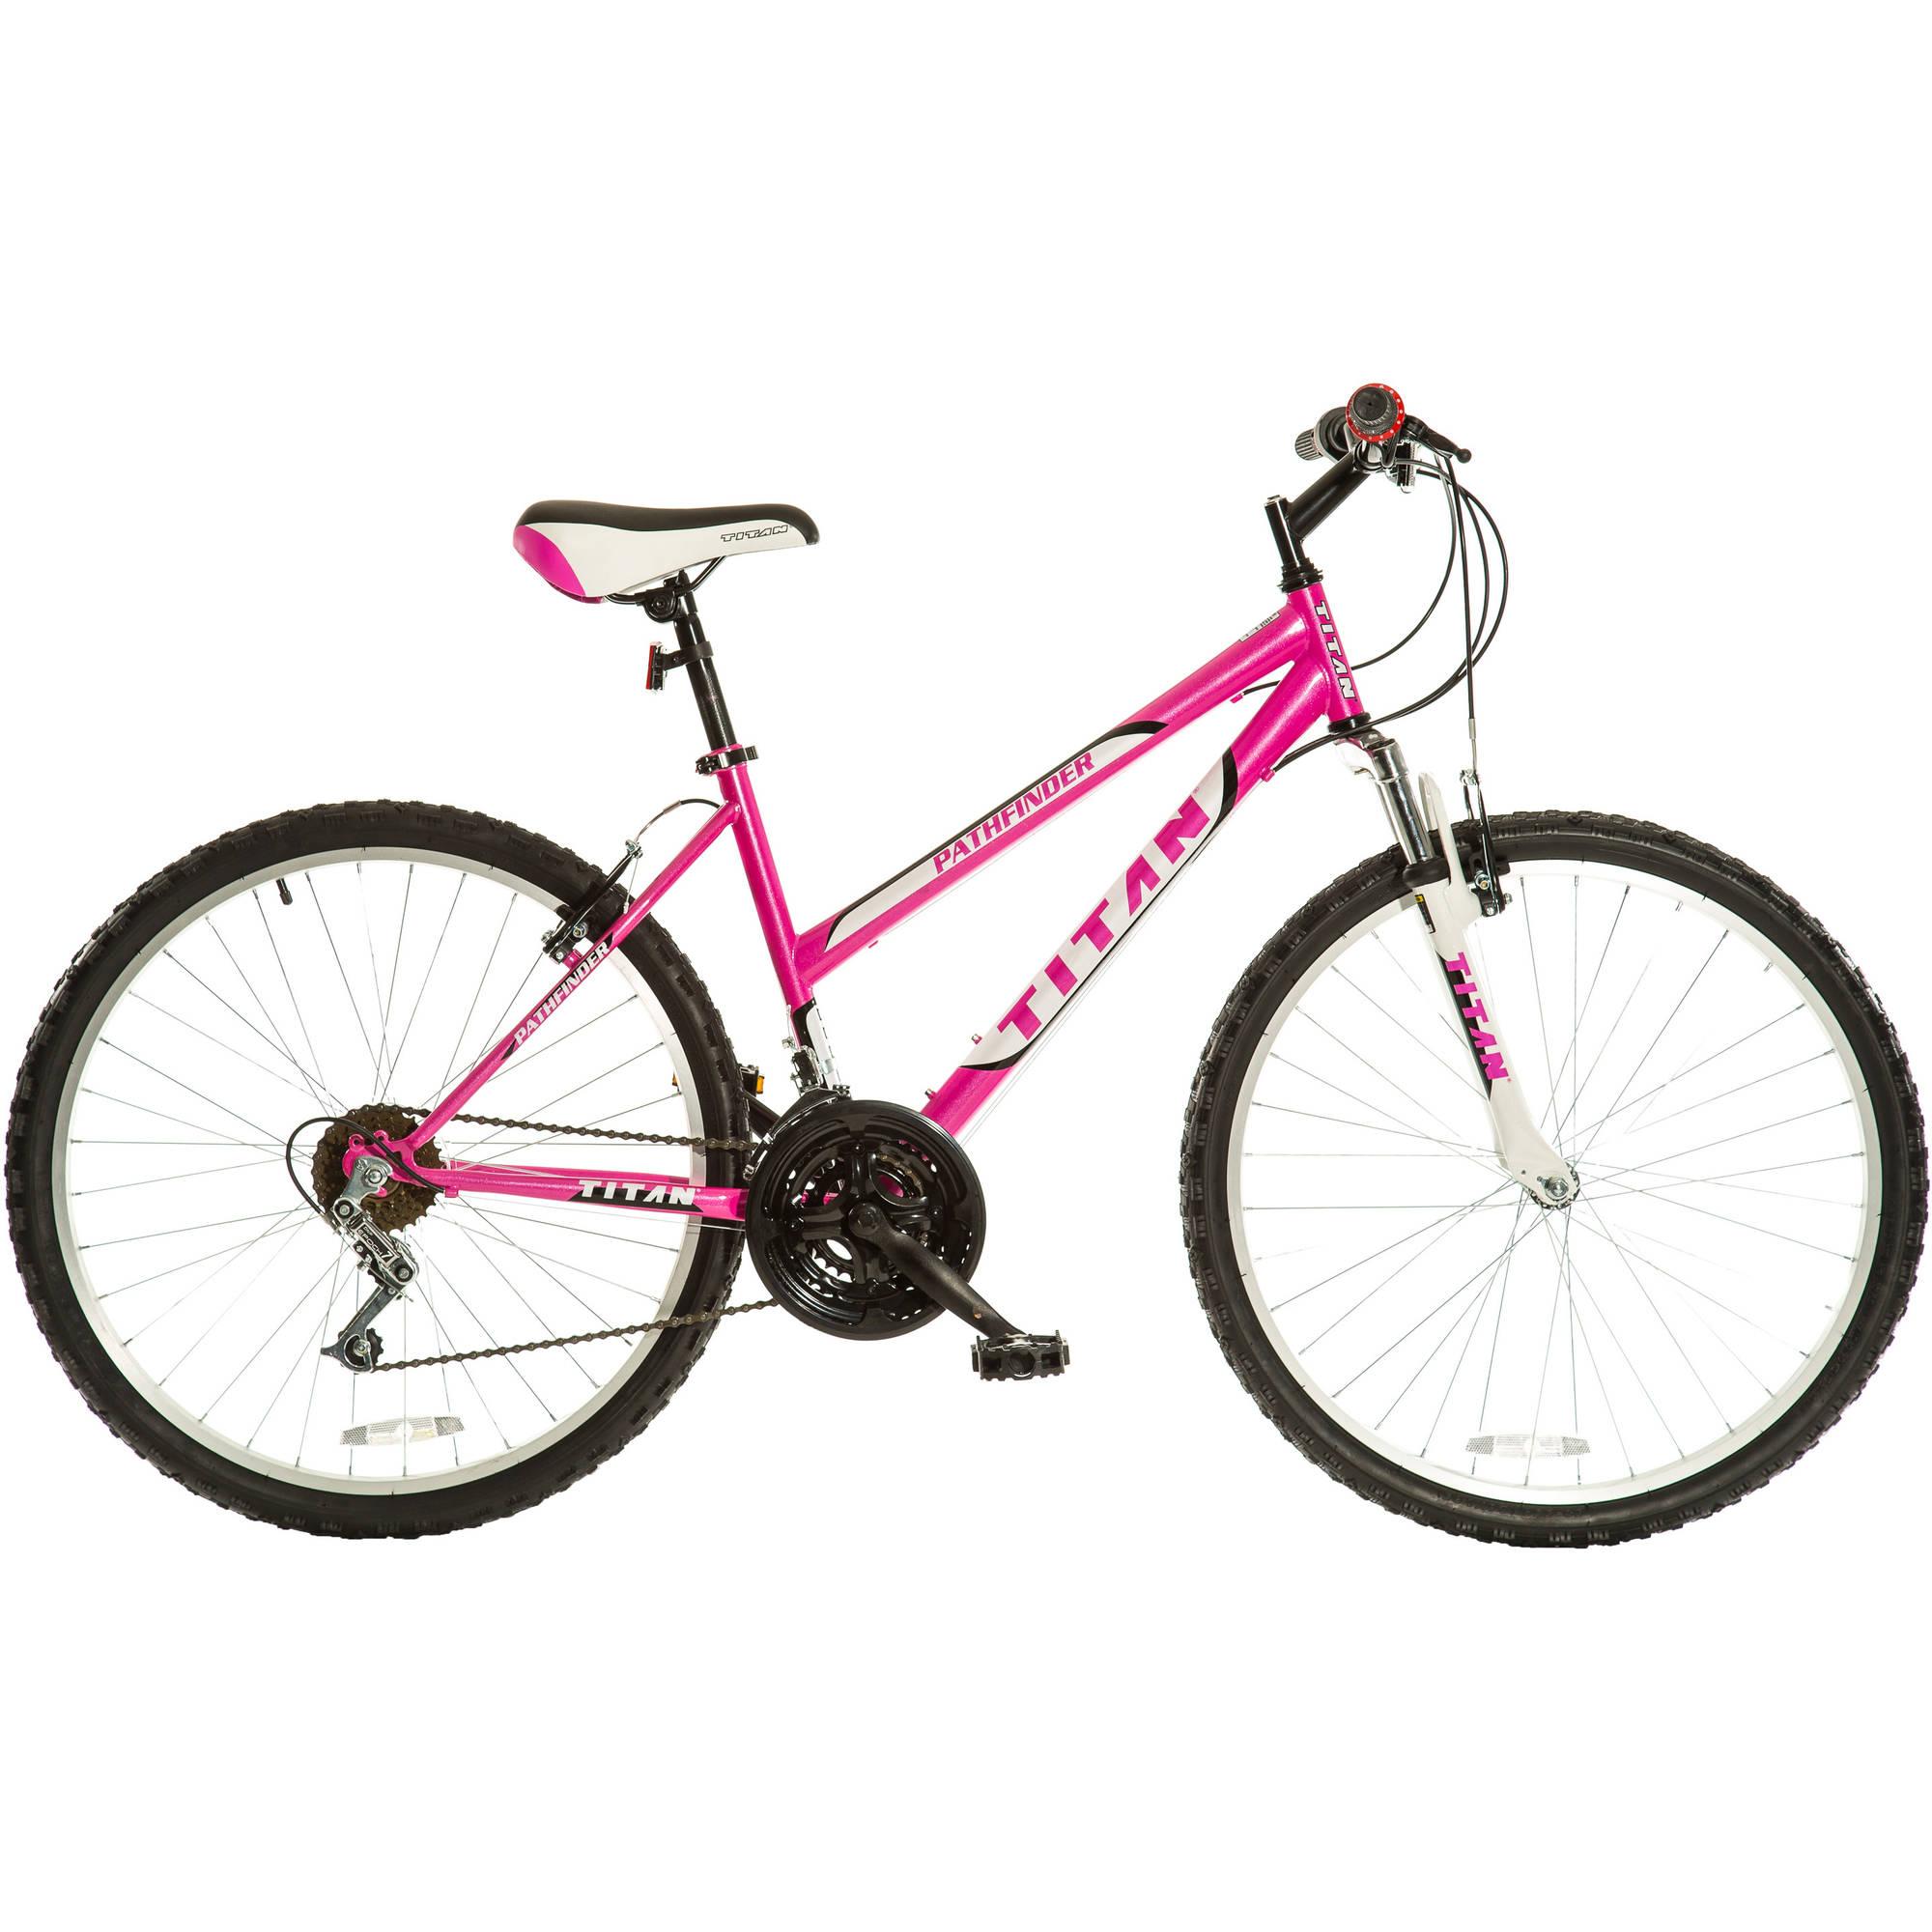 "26"" Titan Pathfinder Women's 18-Speed Suspension Mountain Bike, Hot Pink by Titan"